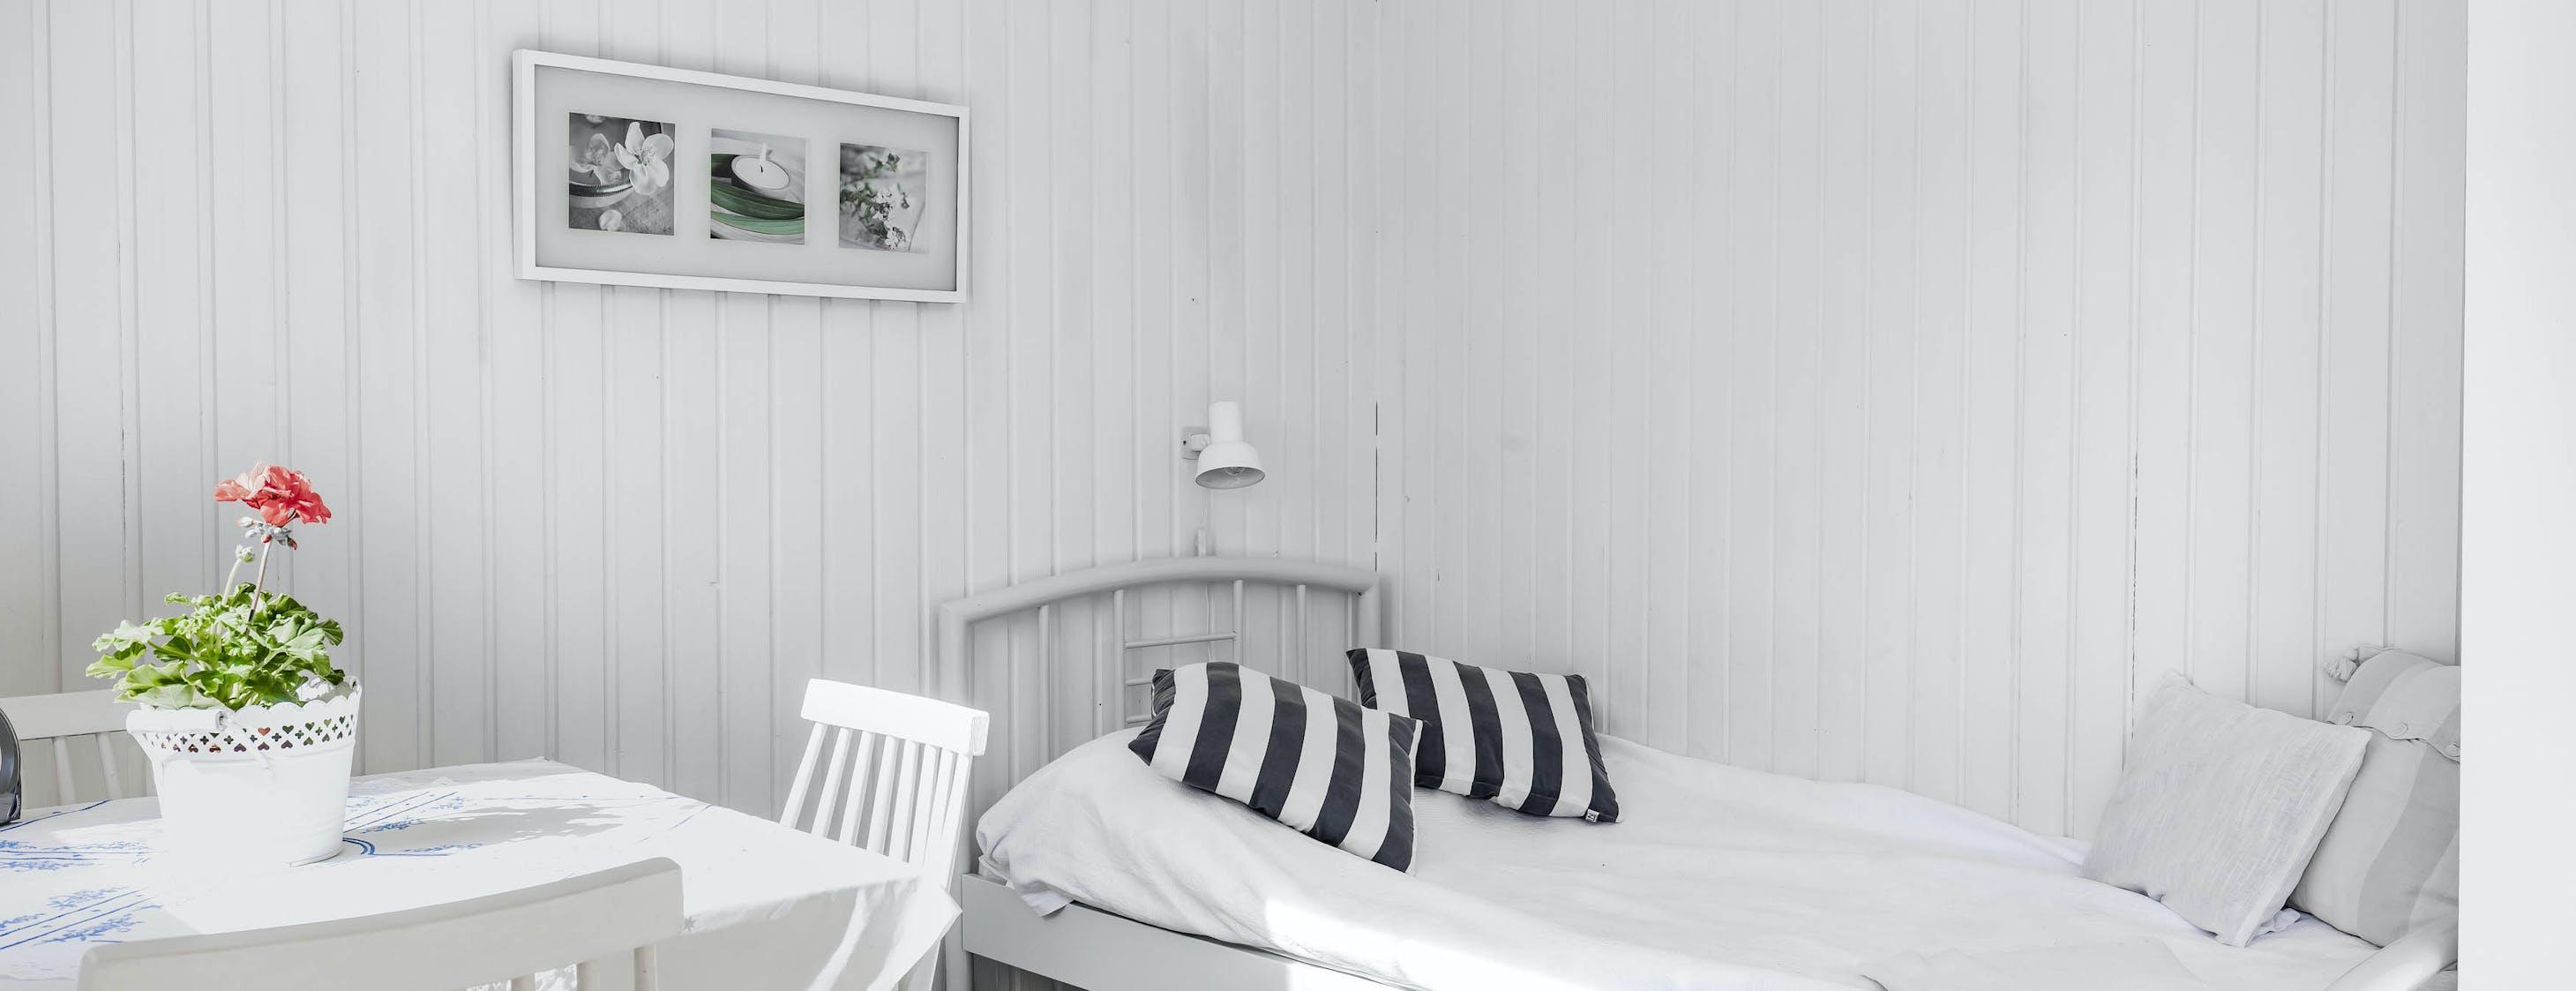 Ekerum camping - Stuga 51 Ekerum Camping